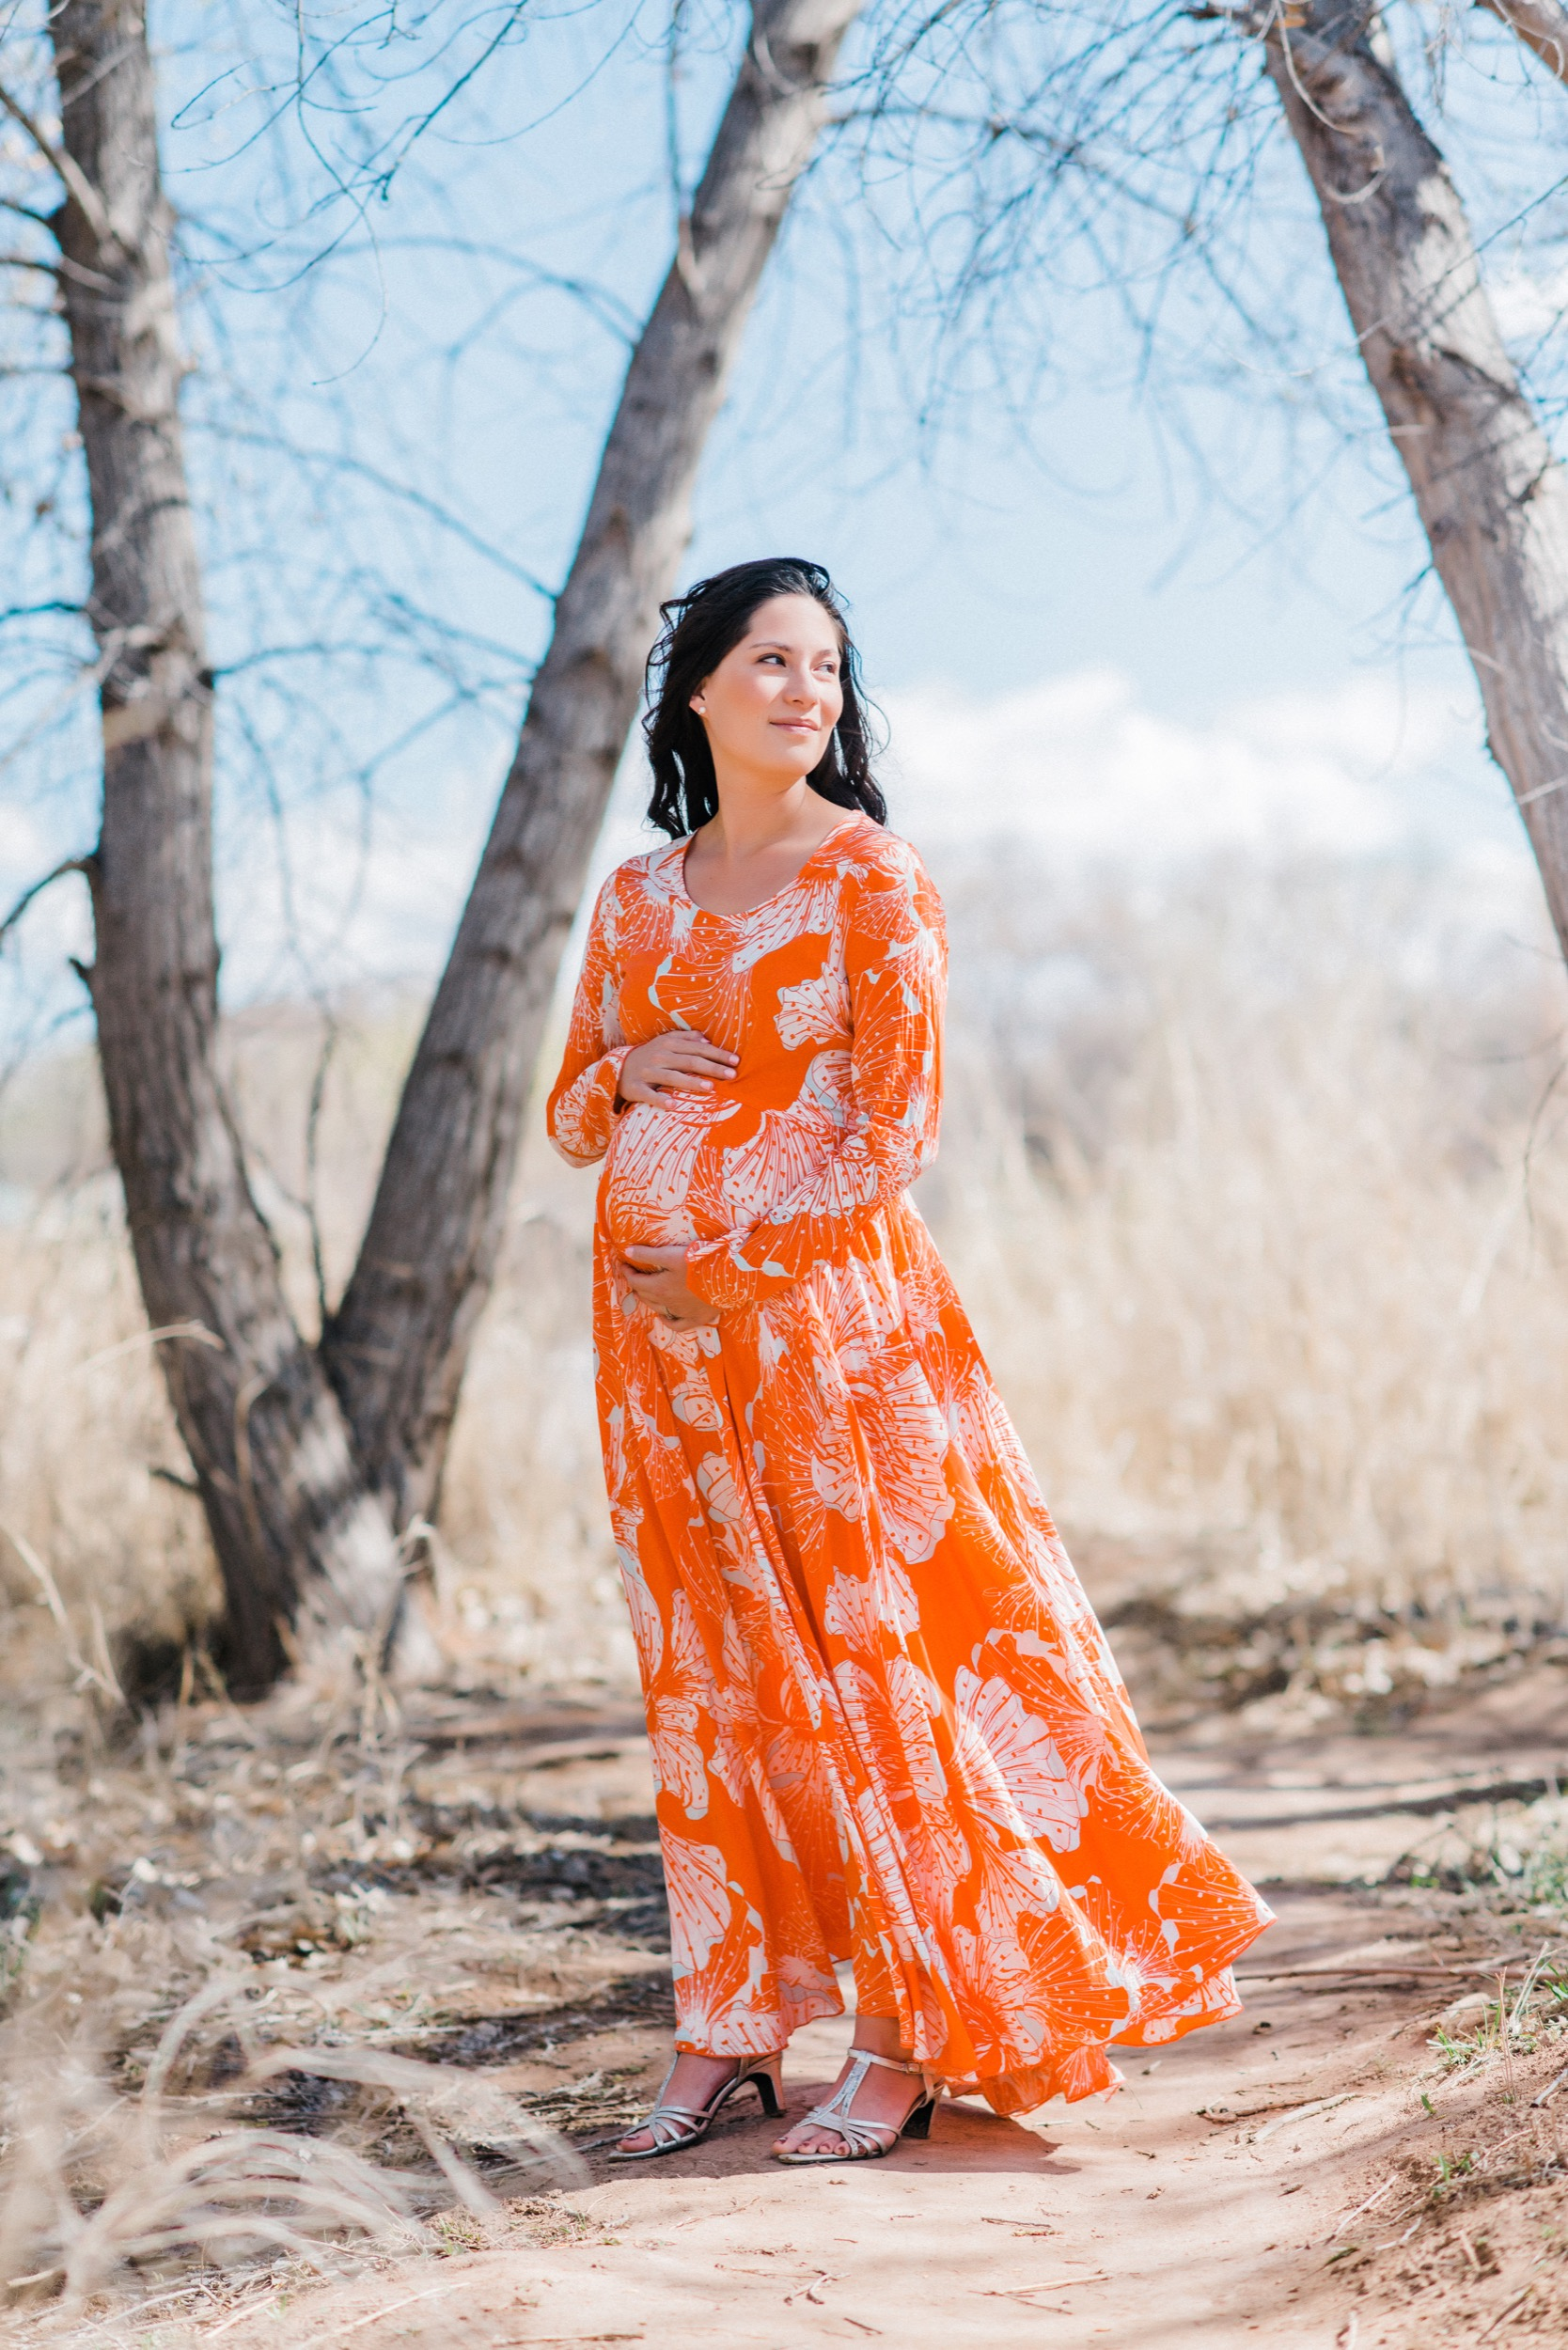 Carissa and Ben-maternity-southwest photographer-destination photographer-new mexico wedding-1008.jpg